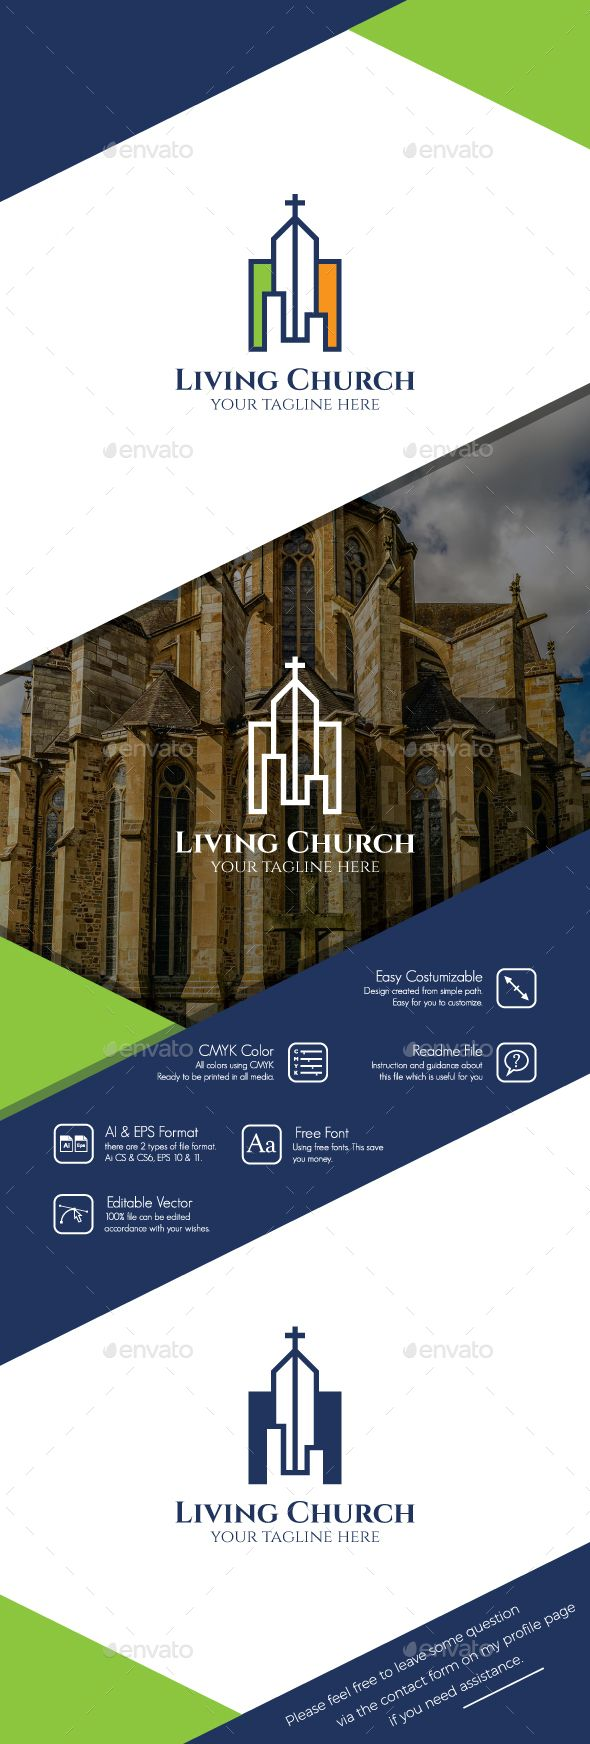 Living Church Logo — Vector EPS #bible #church logo • Download ➝ https://graphicriver.net/item/living-church-logo/19308141?ref=pxcr